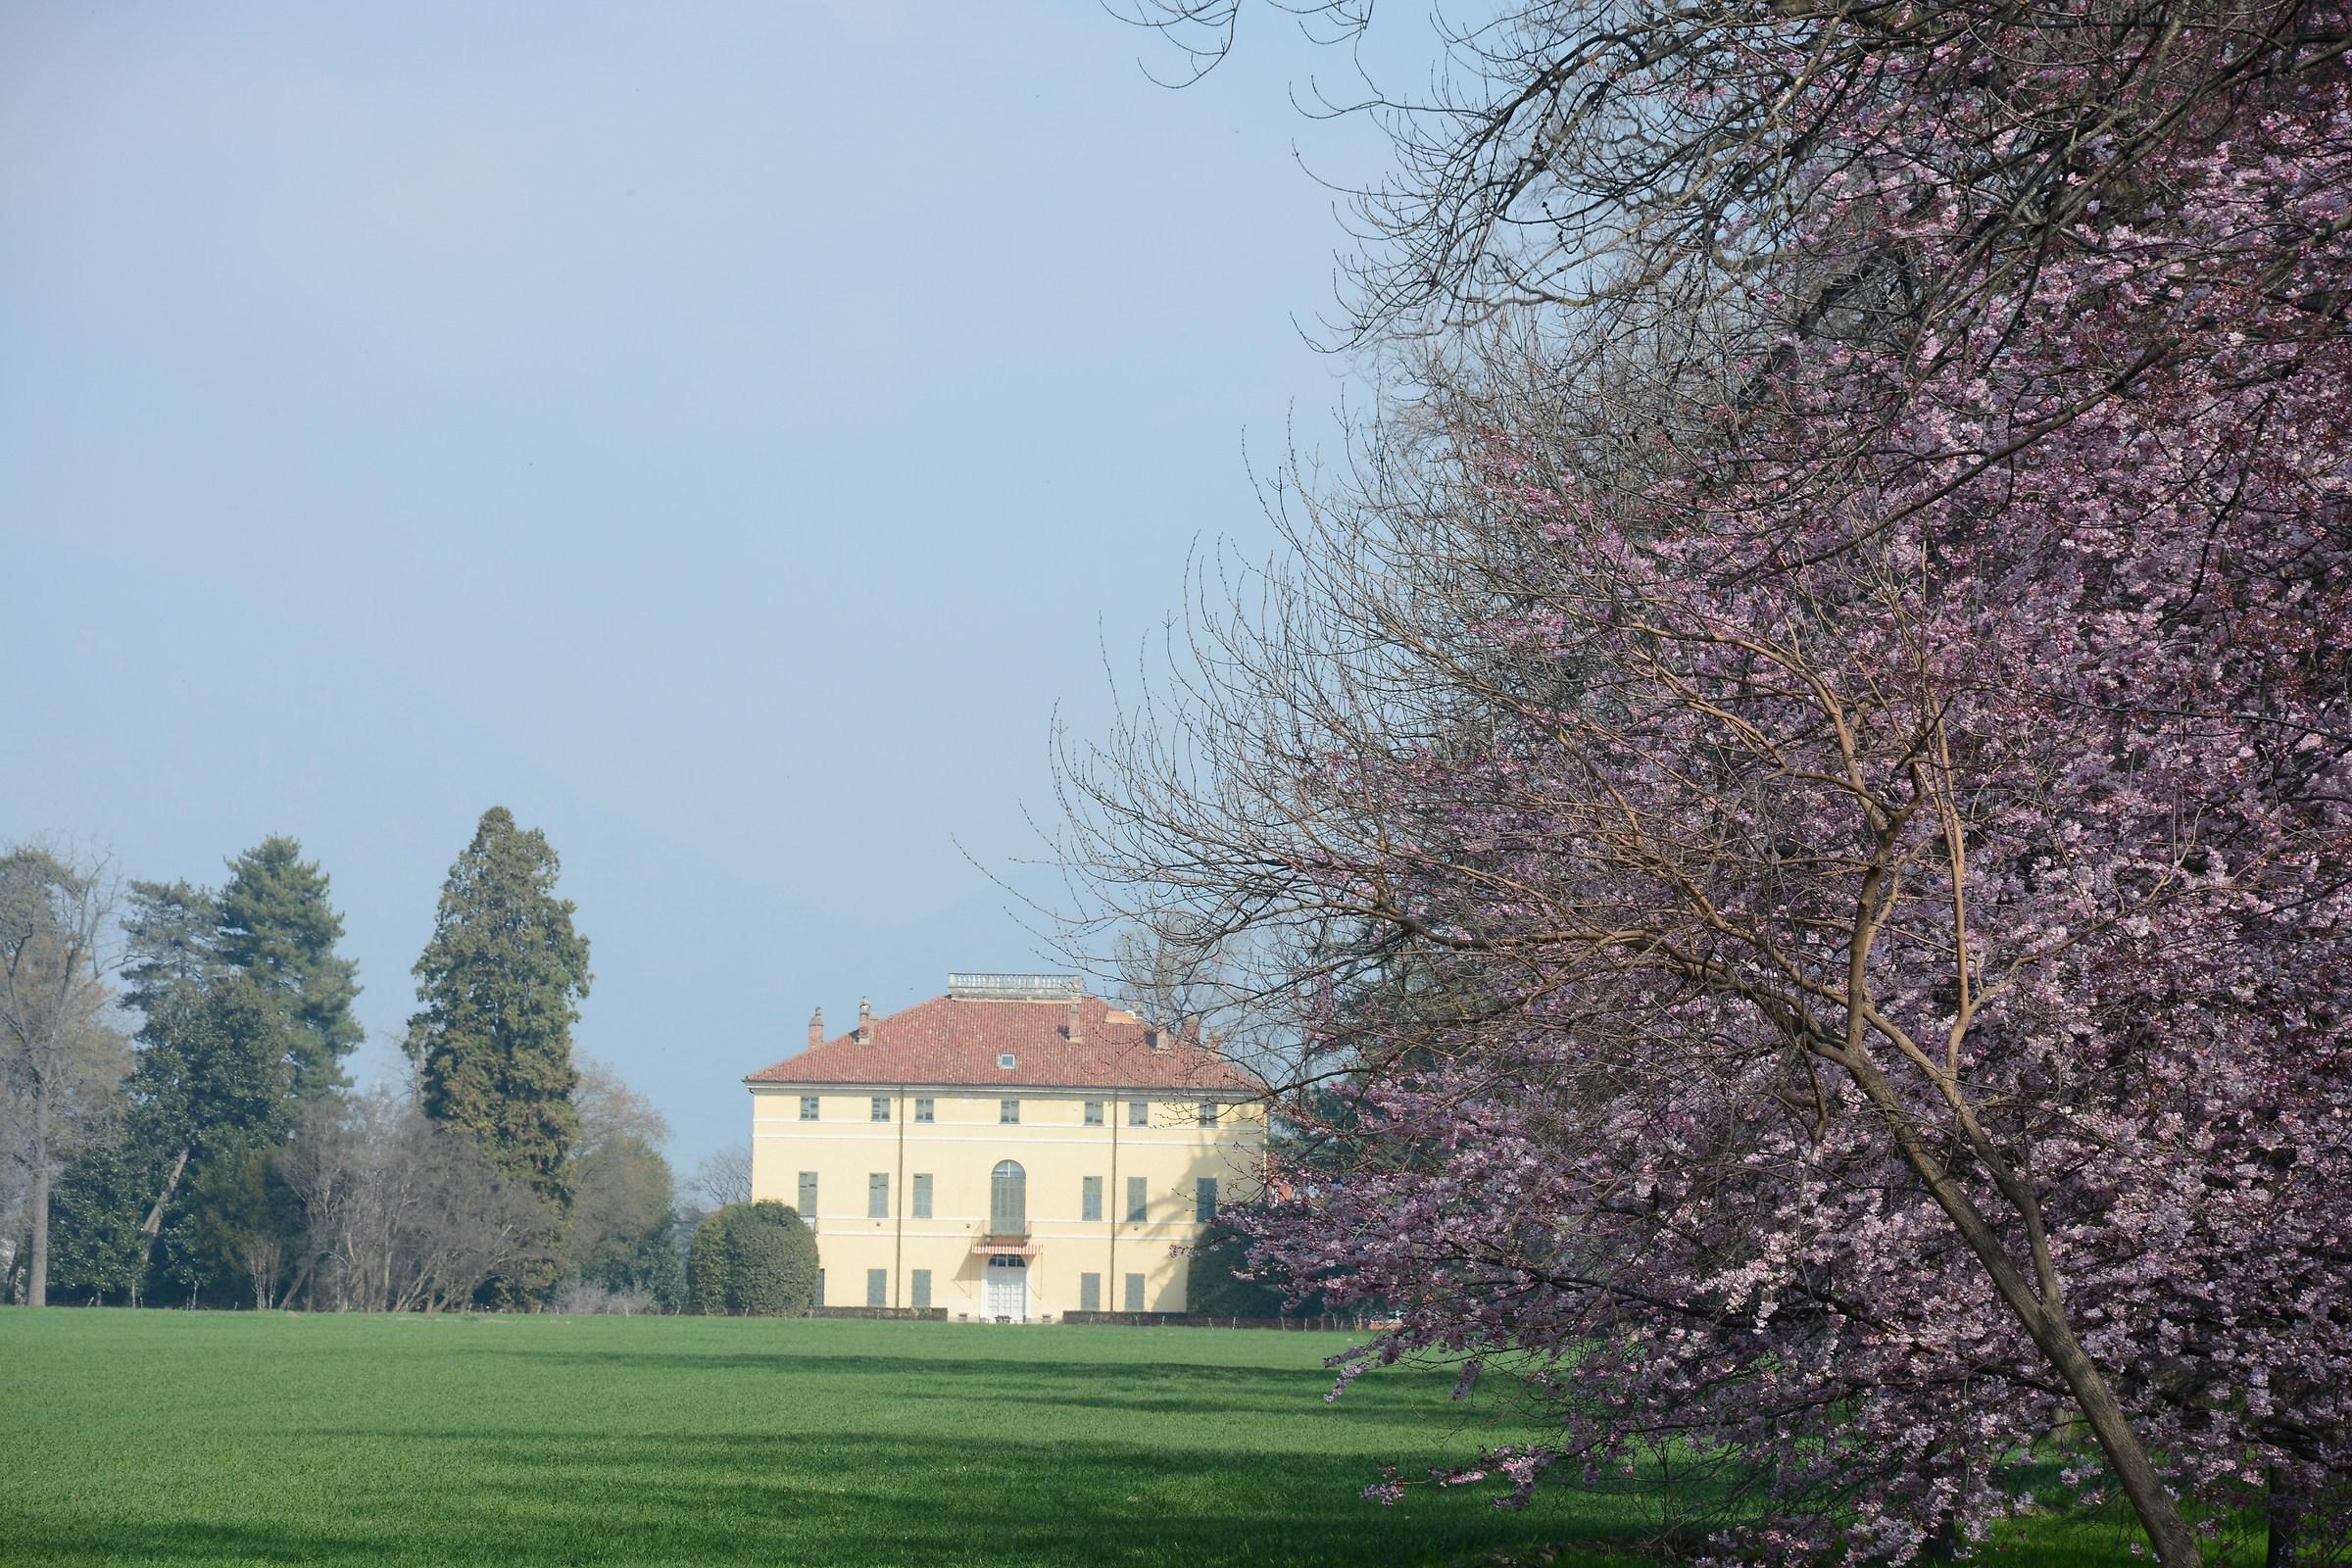 Parco storico del Torrione, Villa Doria...